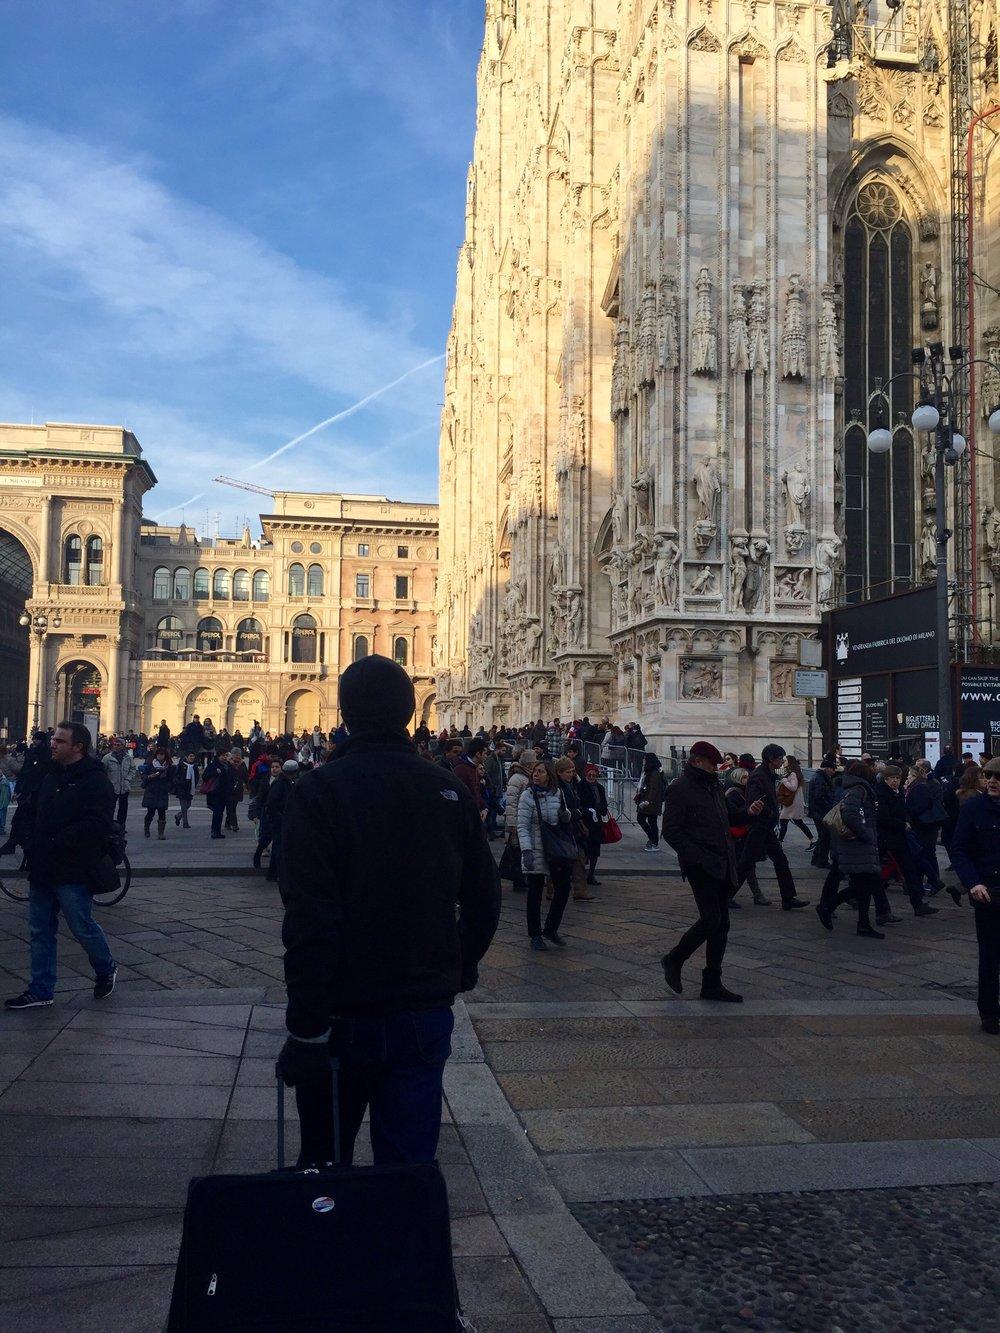 milan cathedral square